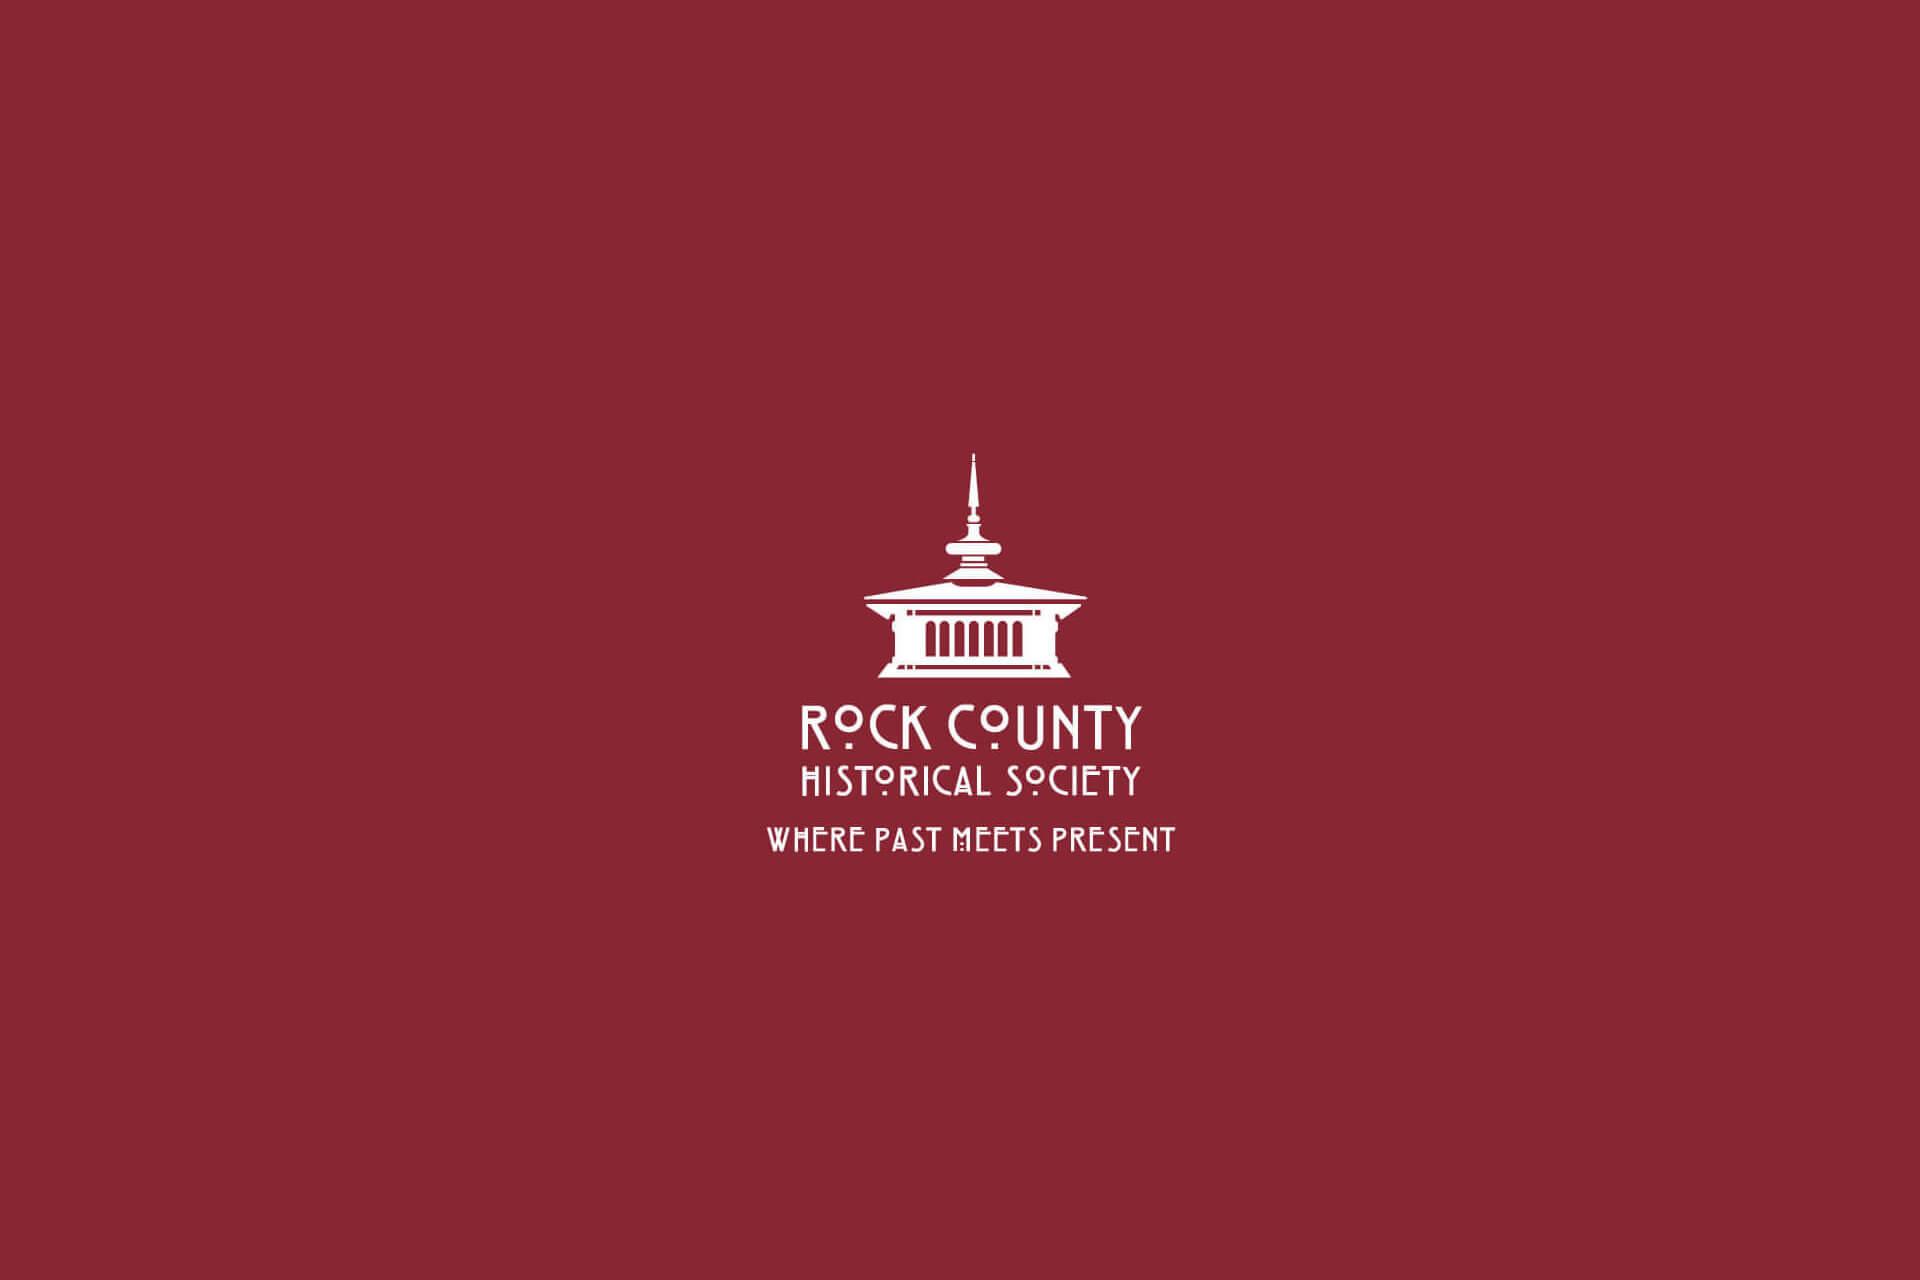 Rock County Historical Society